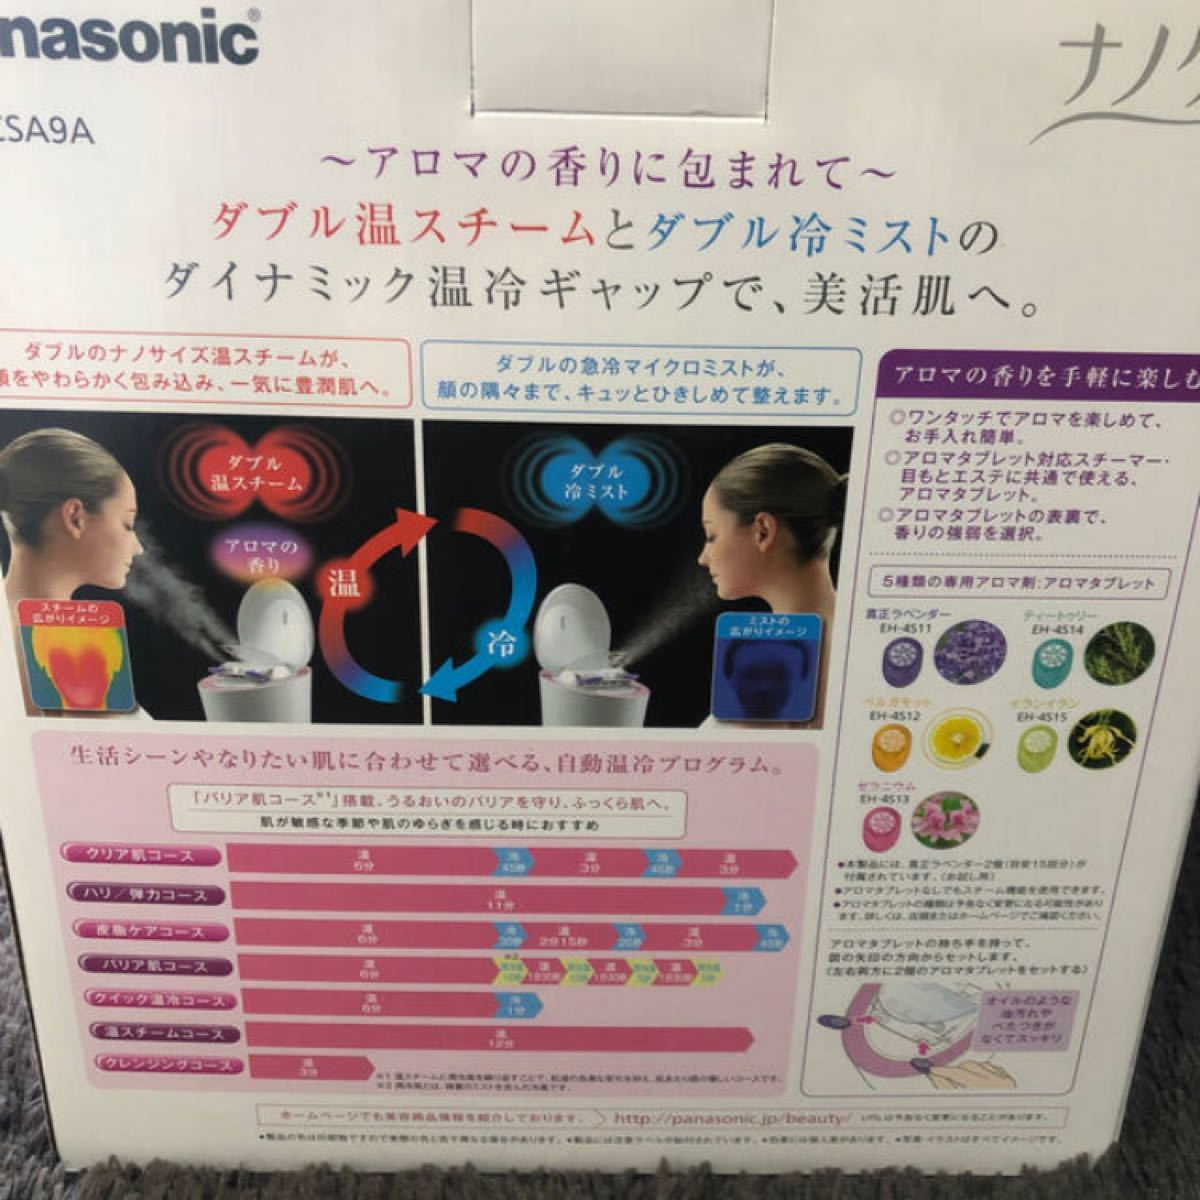 Panasonic  スチーマーナノケア EH-CSA9A ピンク調 新品未使用品 パナソニック 今日だけ値下げ